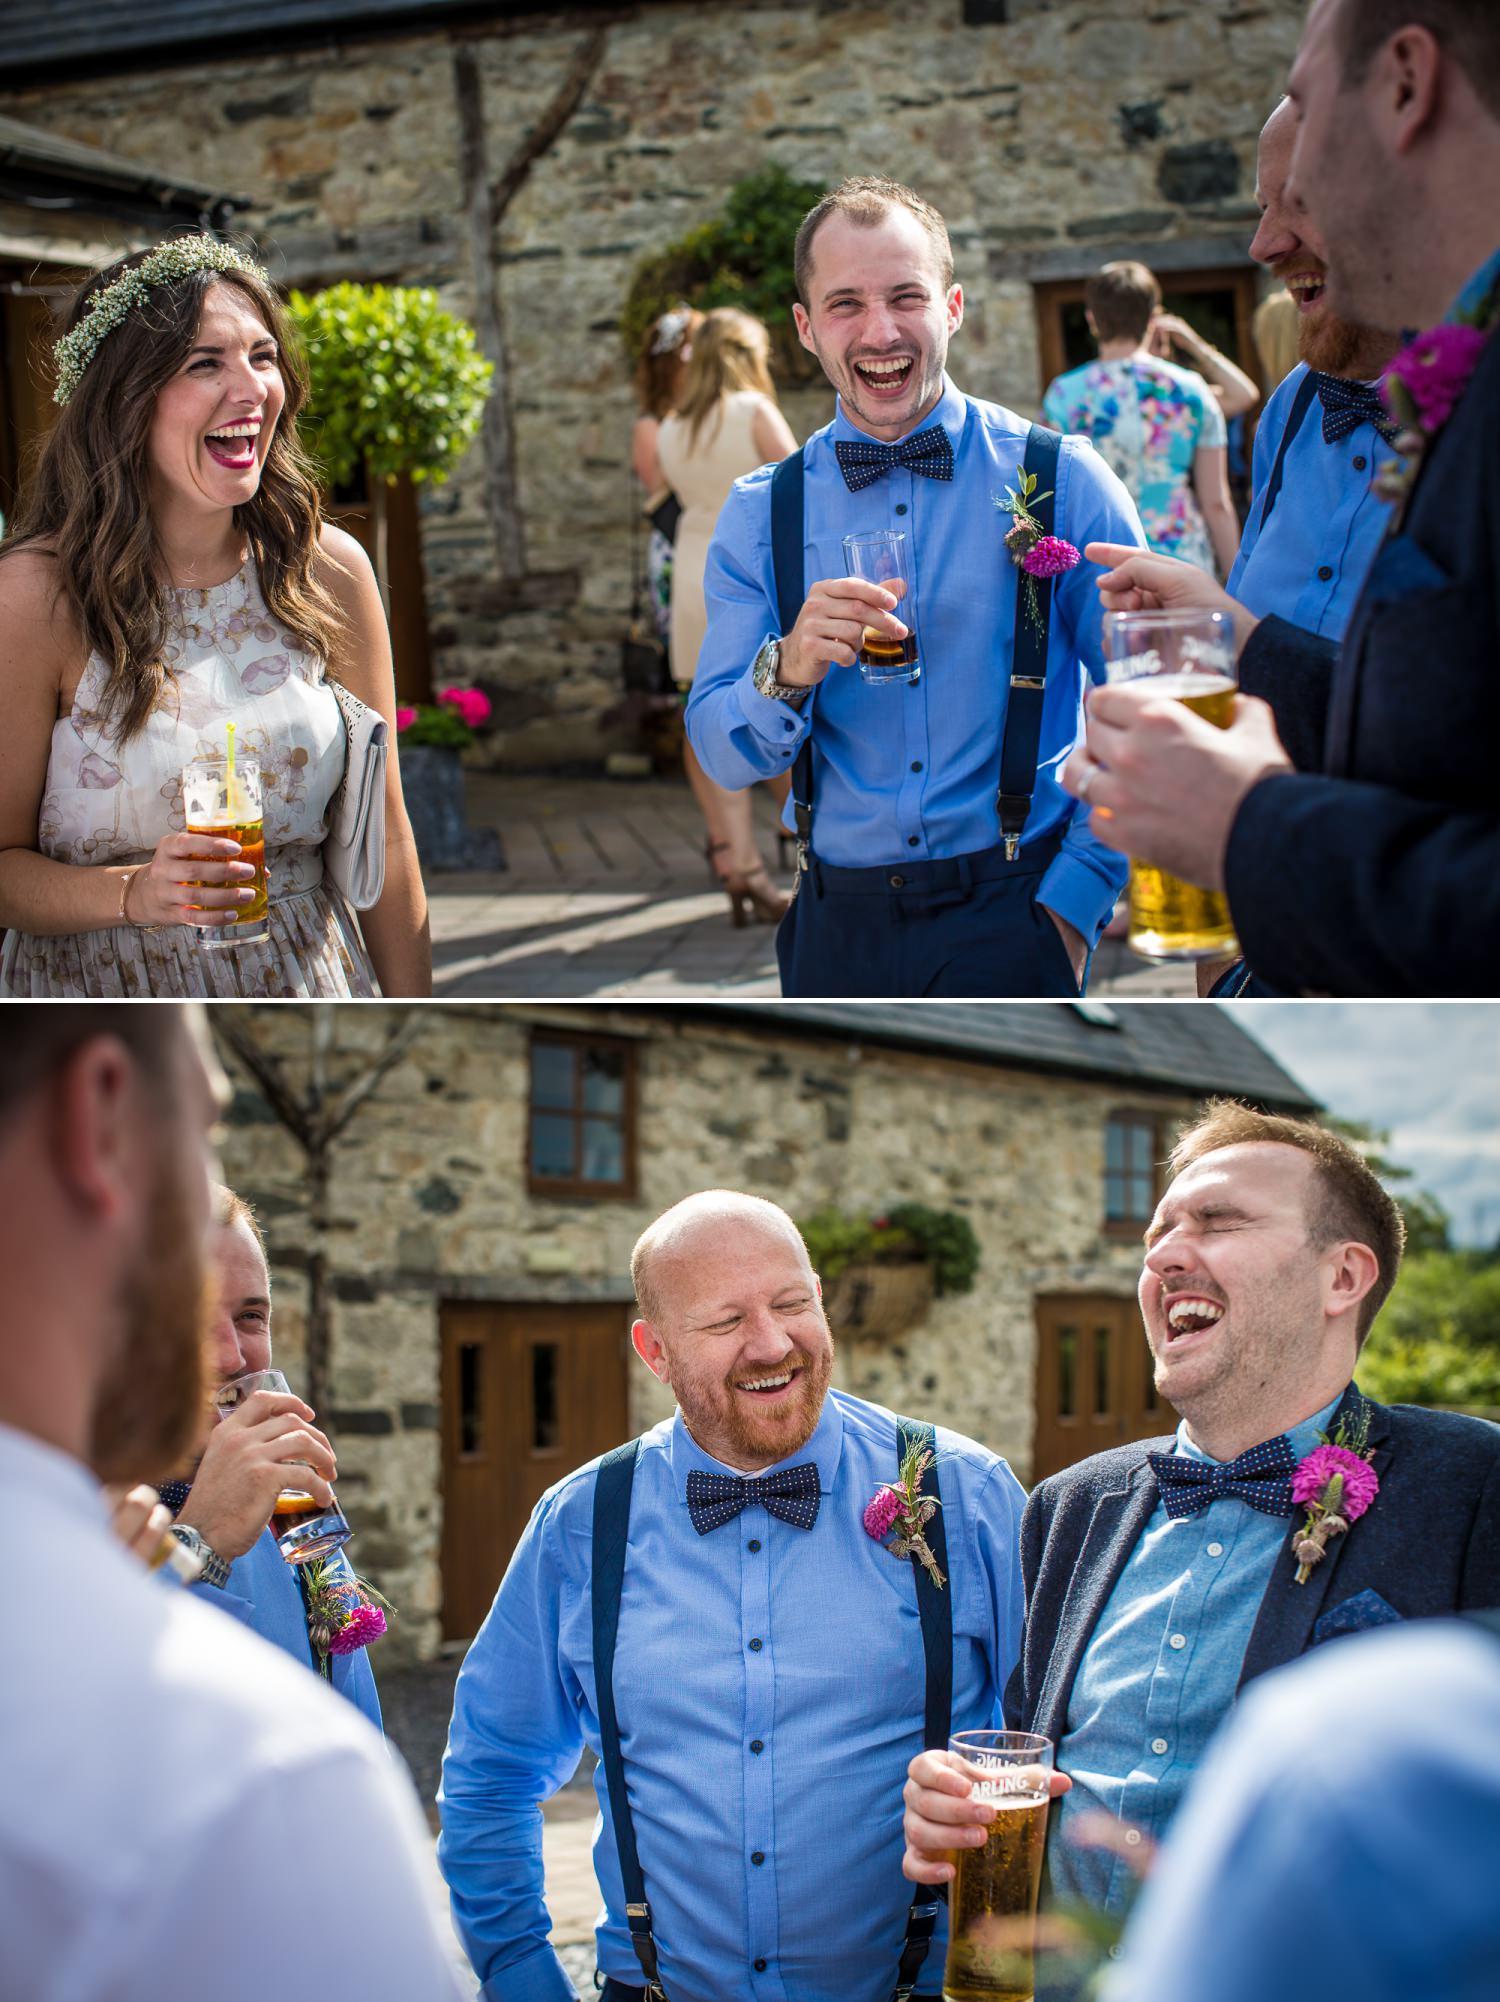 Guests enjoying a drink wedding photograph at Plas Isaf